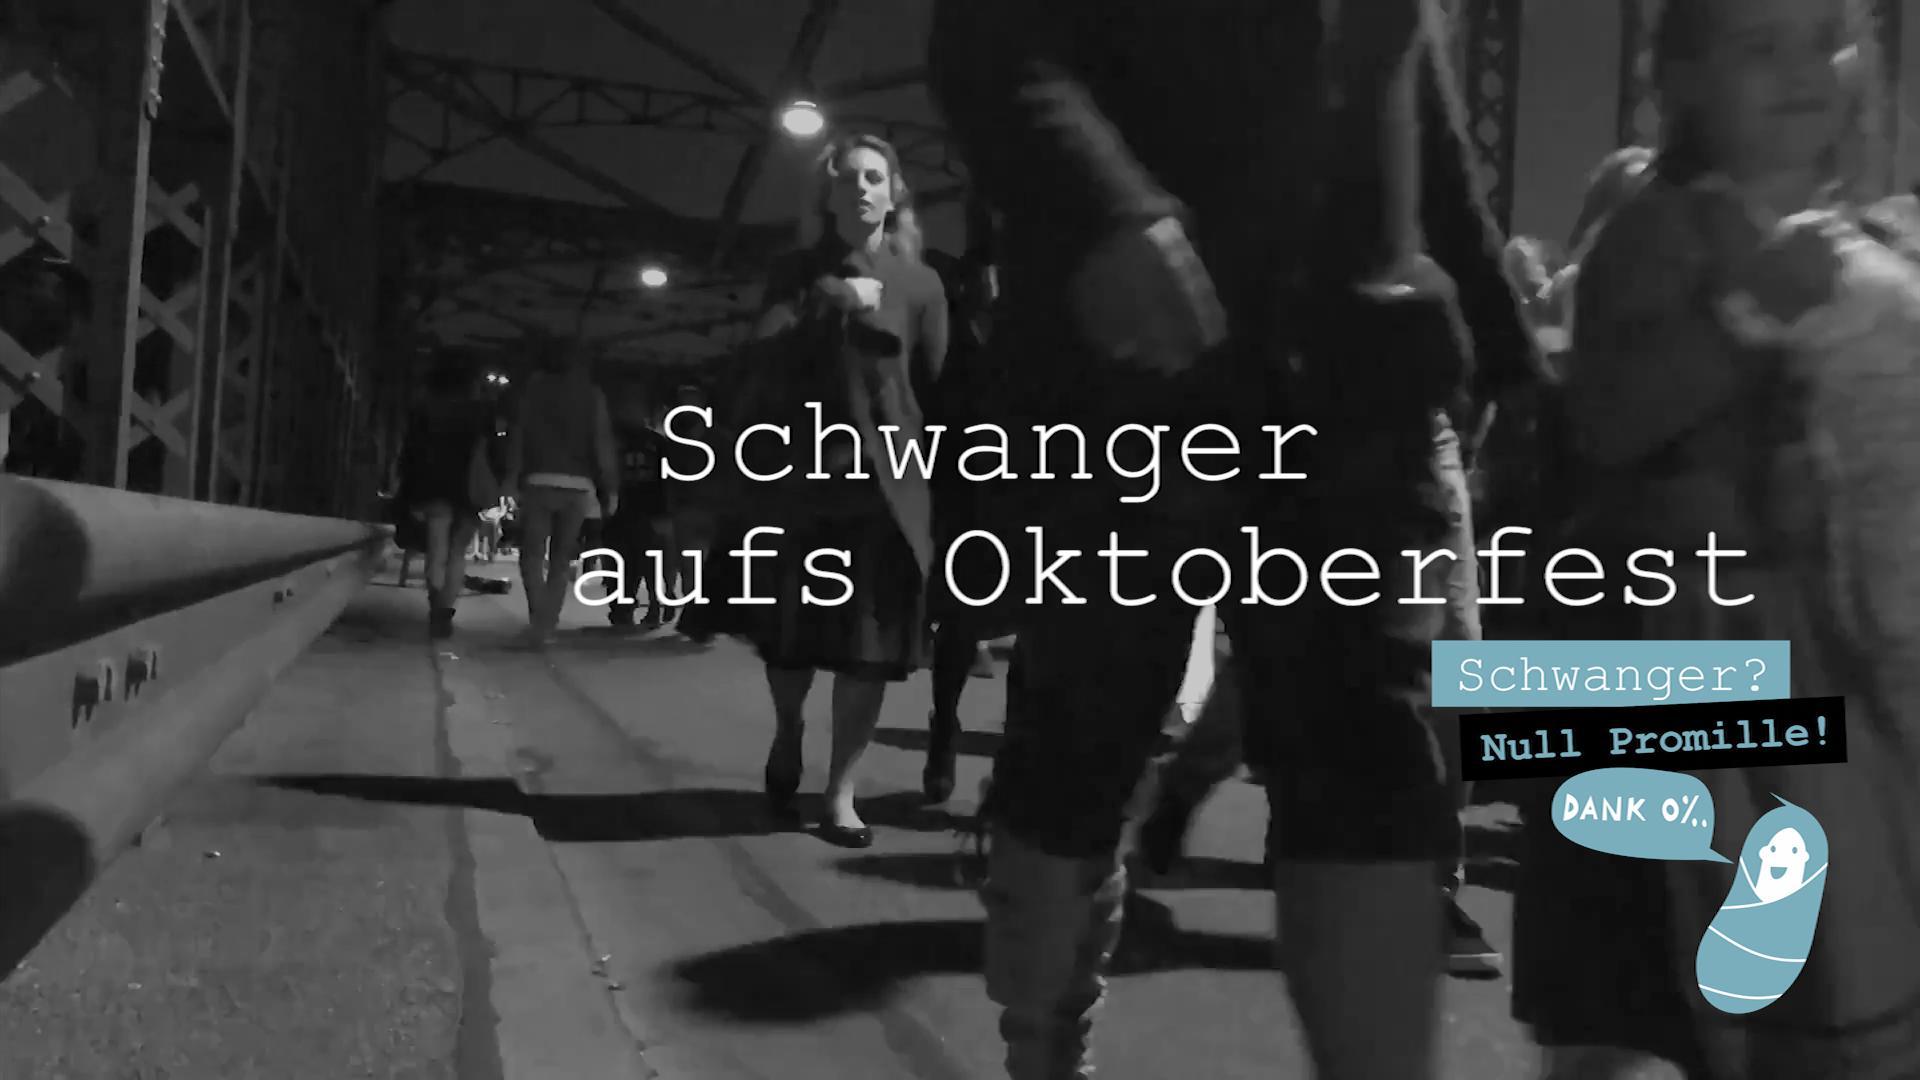 Schwanger-Null-Promille-aufs-Oktoberfest-Spass-auf-der-Wiesn-2018-SNP-Wiesn2-THUMB